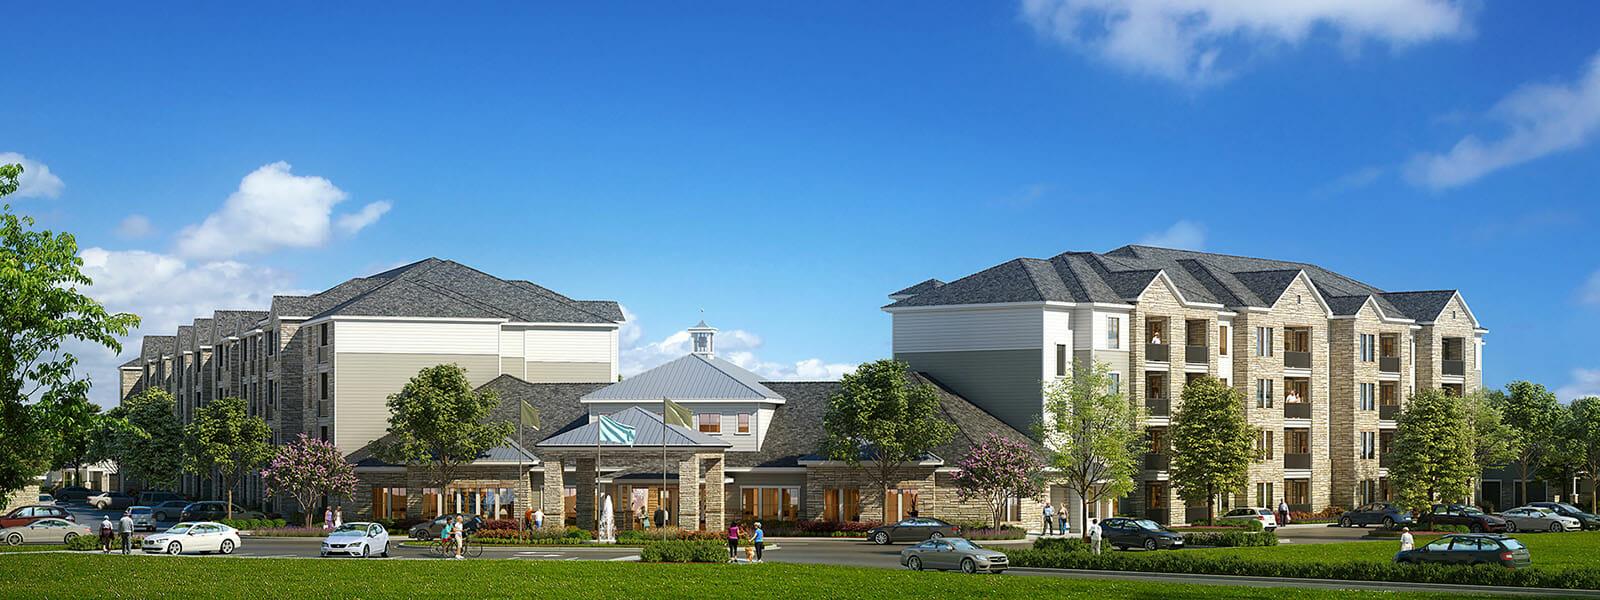 Senior Living Apartments near Houston TX | The Retreat at Barbers Hill